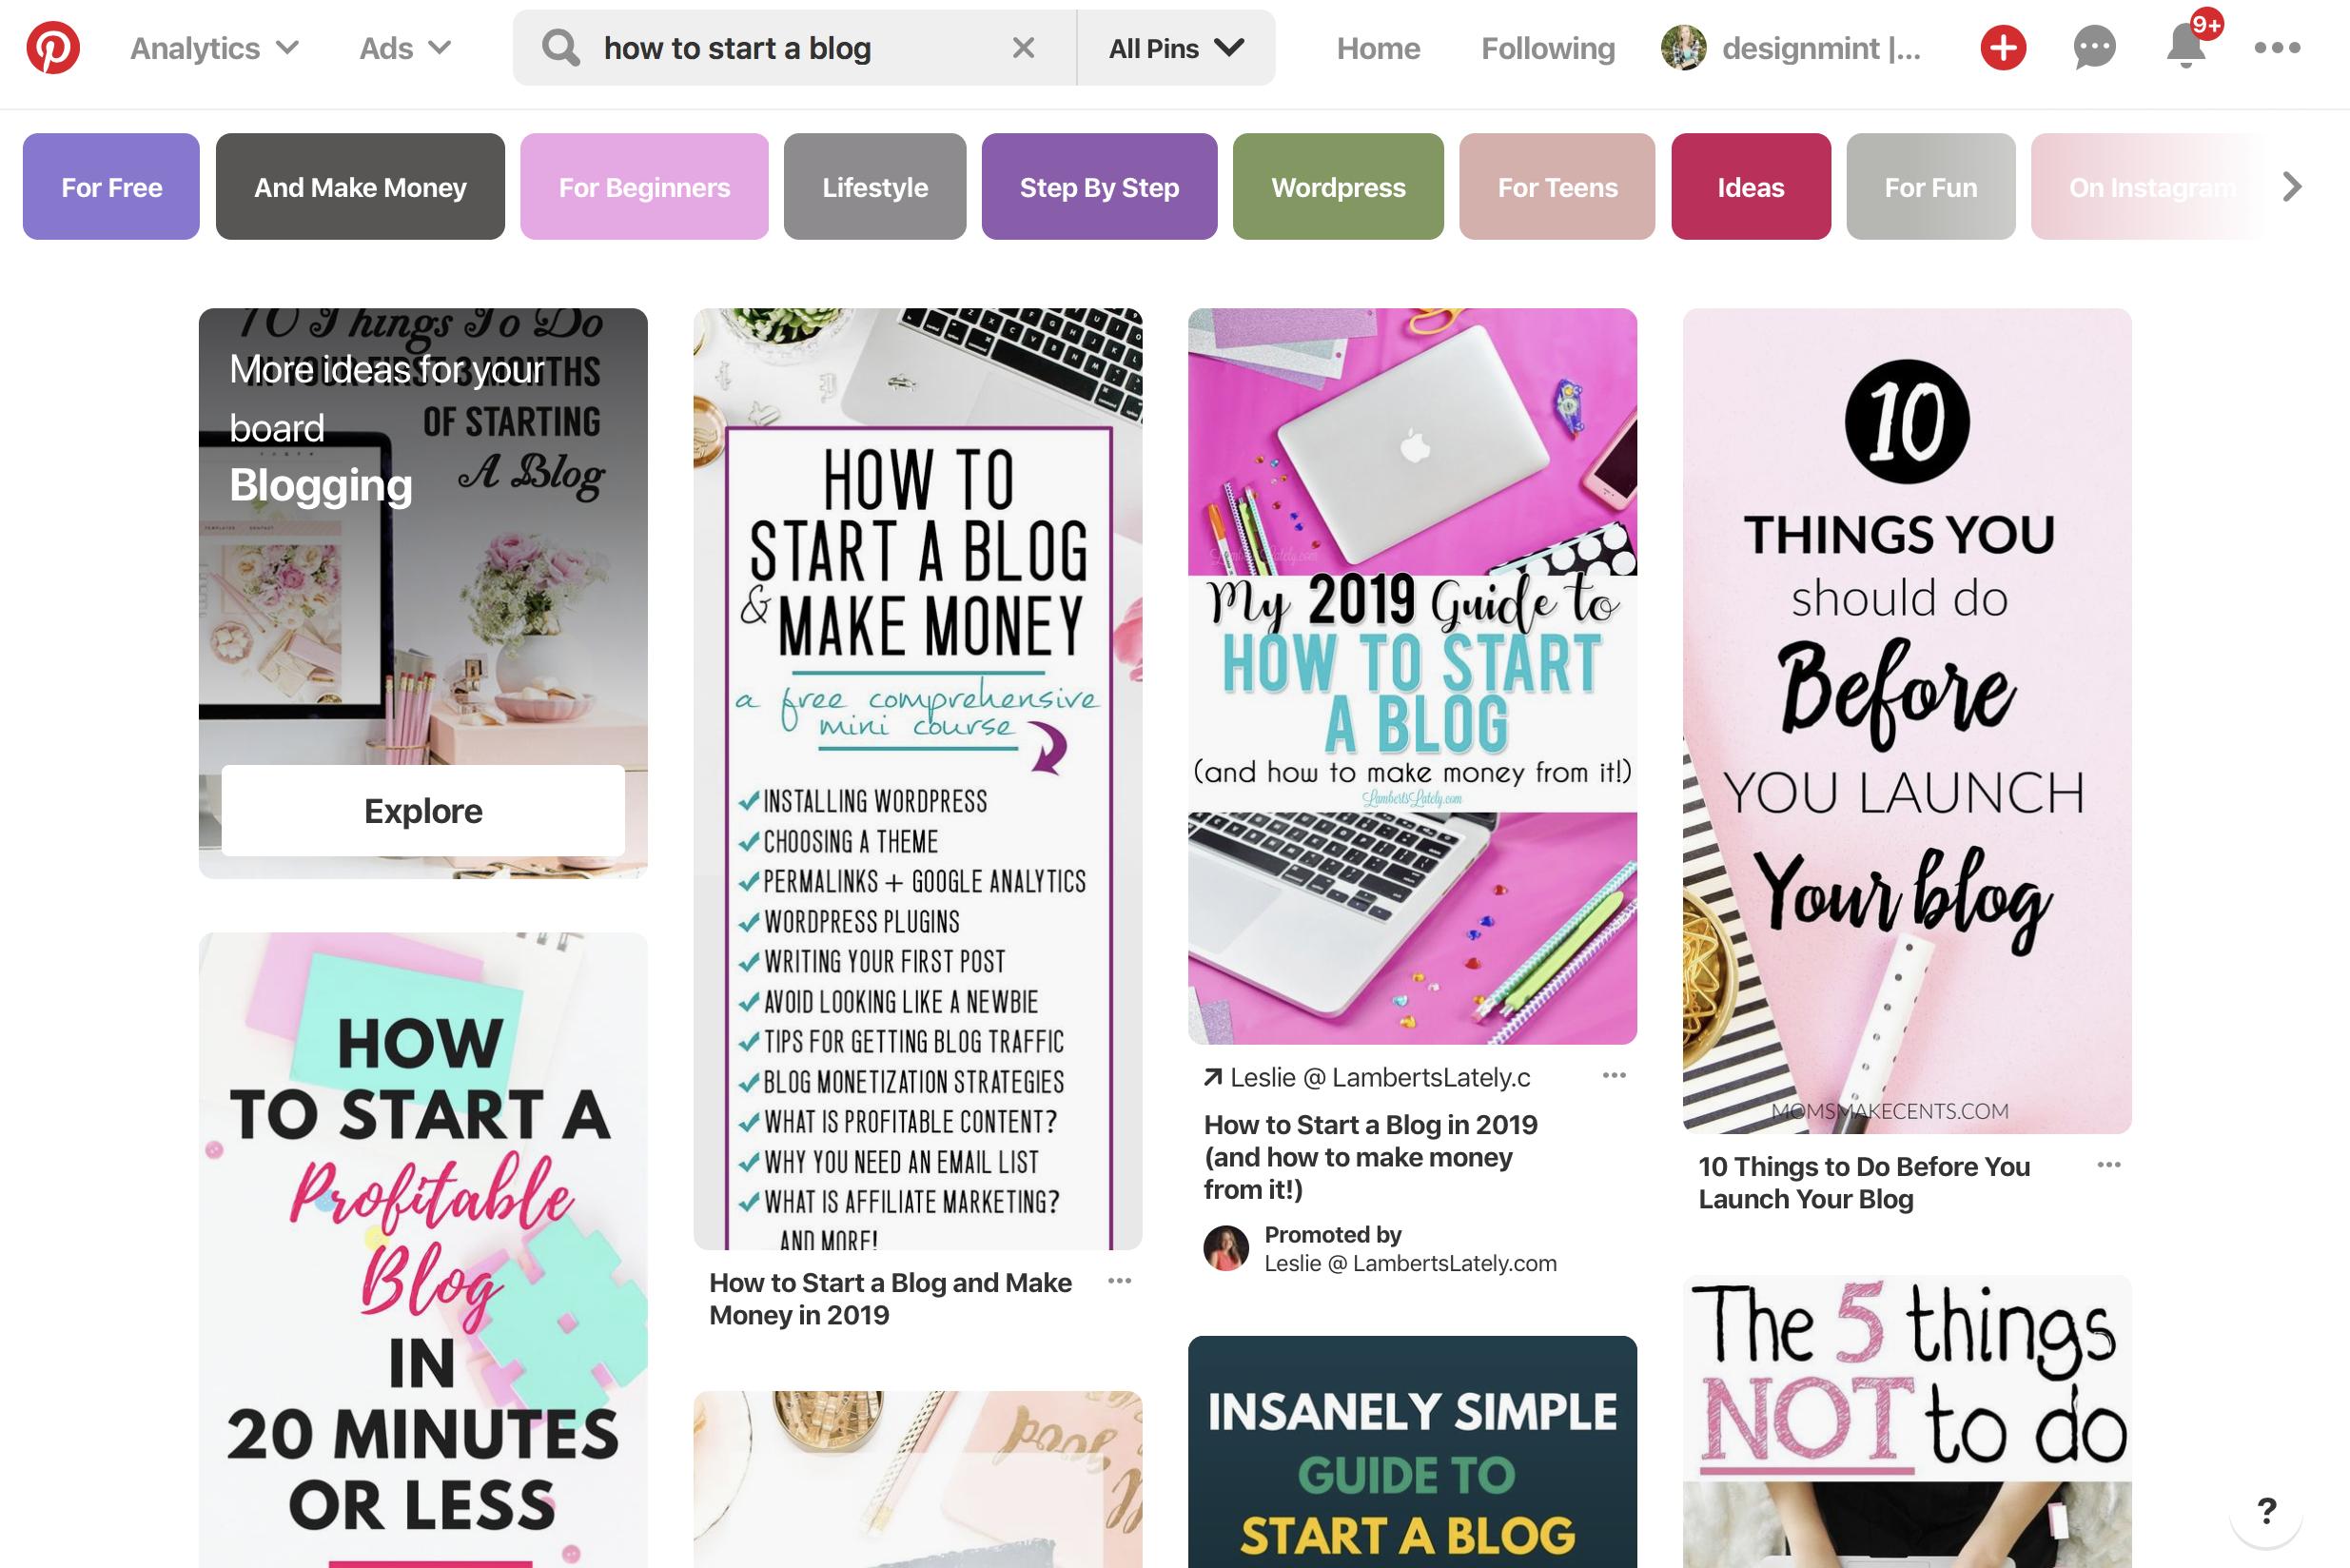 Pinterest marketing keyword SEO research